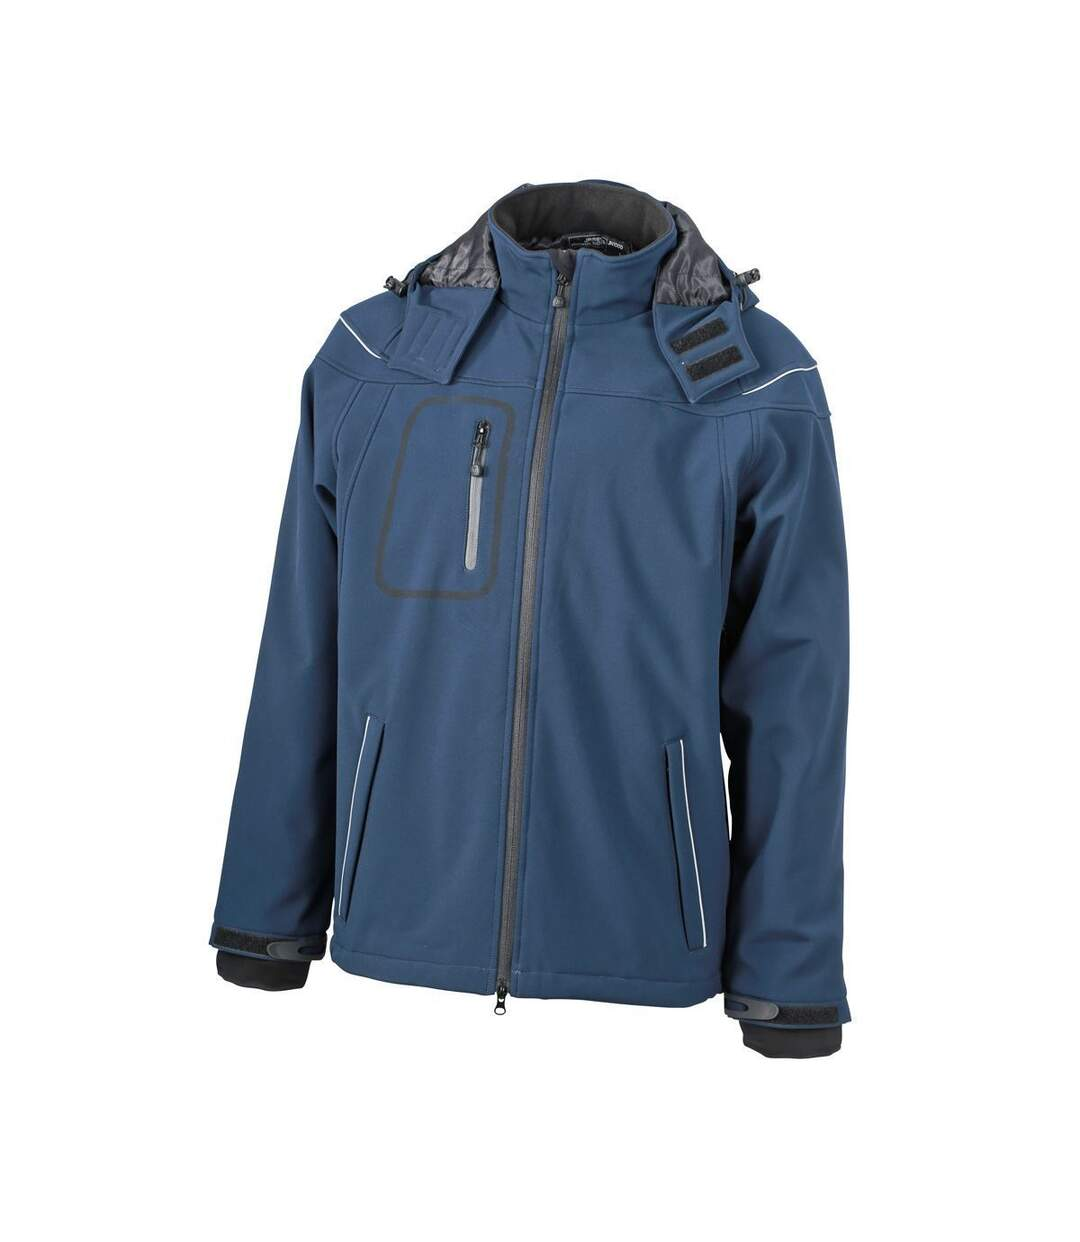 Veste softshell hiver Homme - JN1000 - Bleu marine